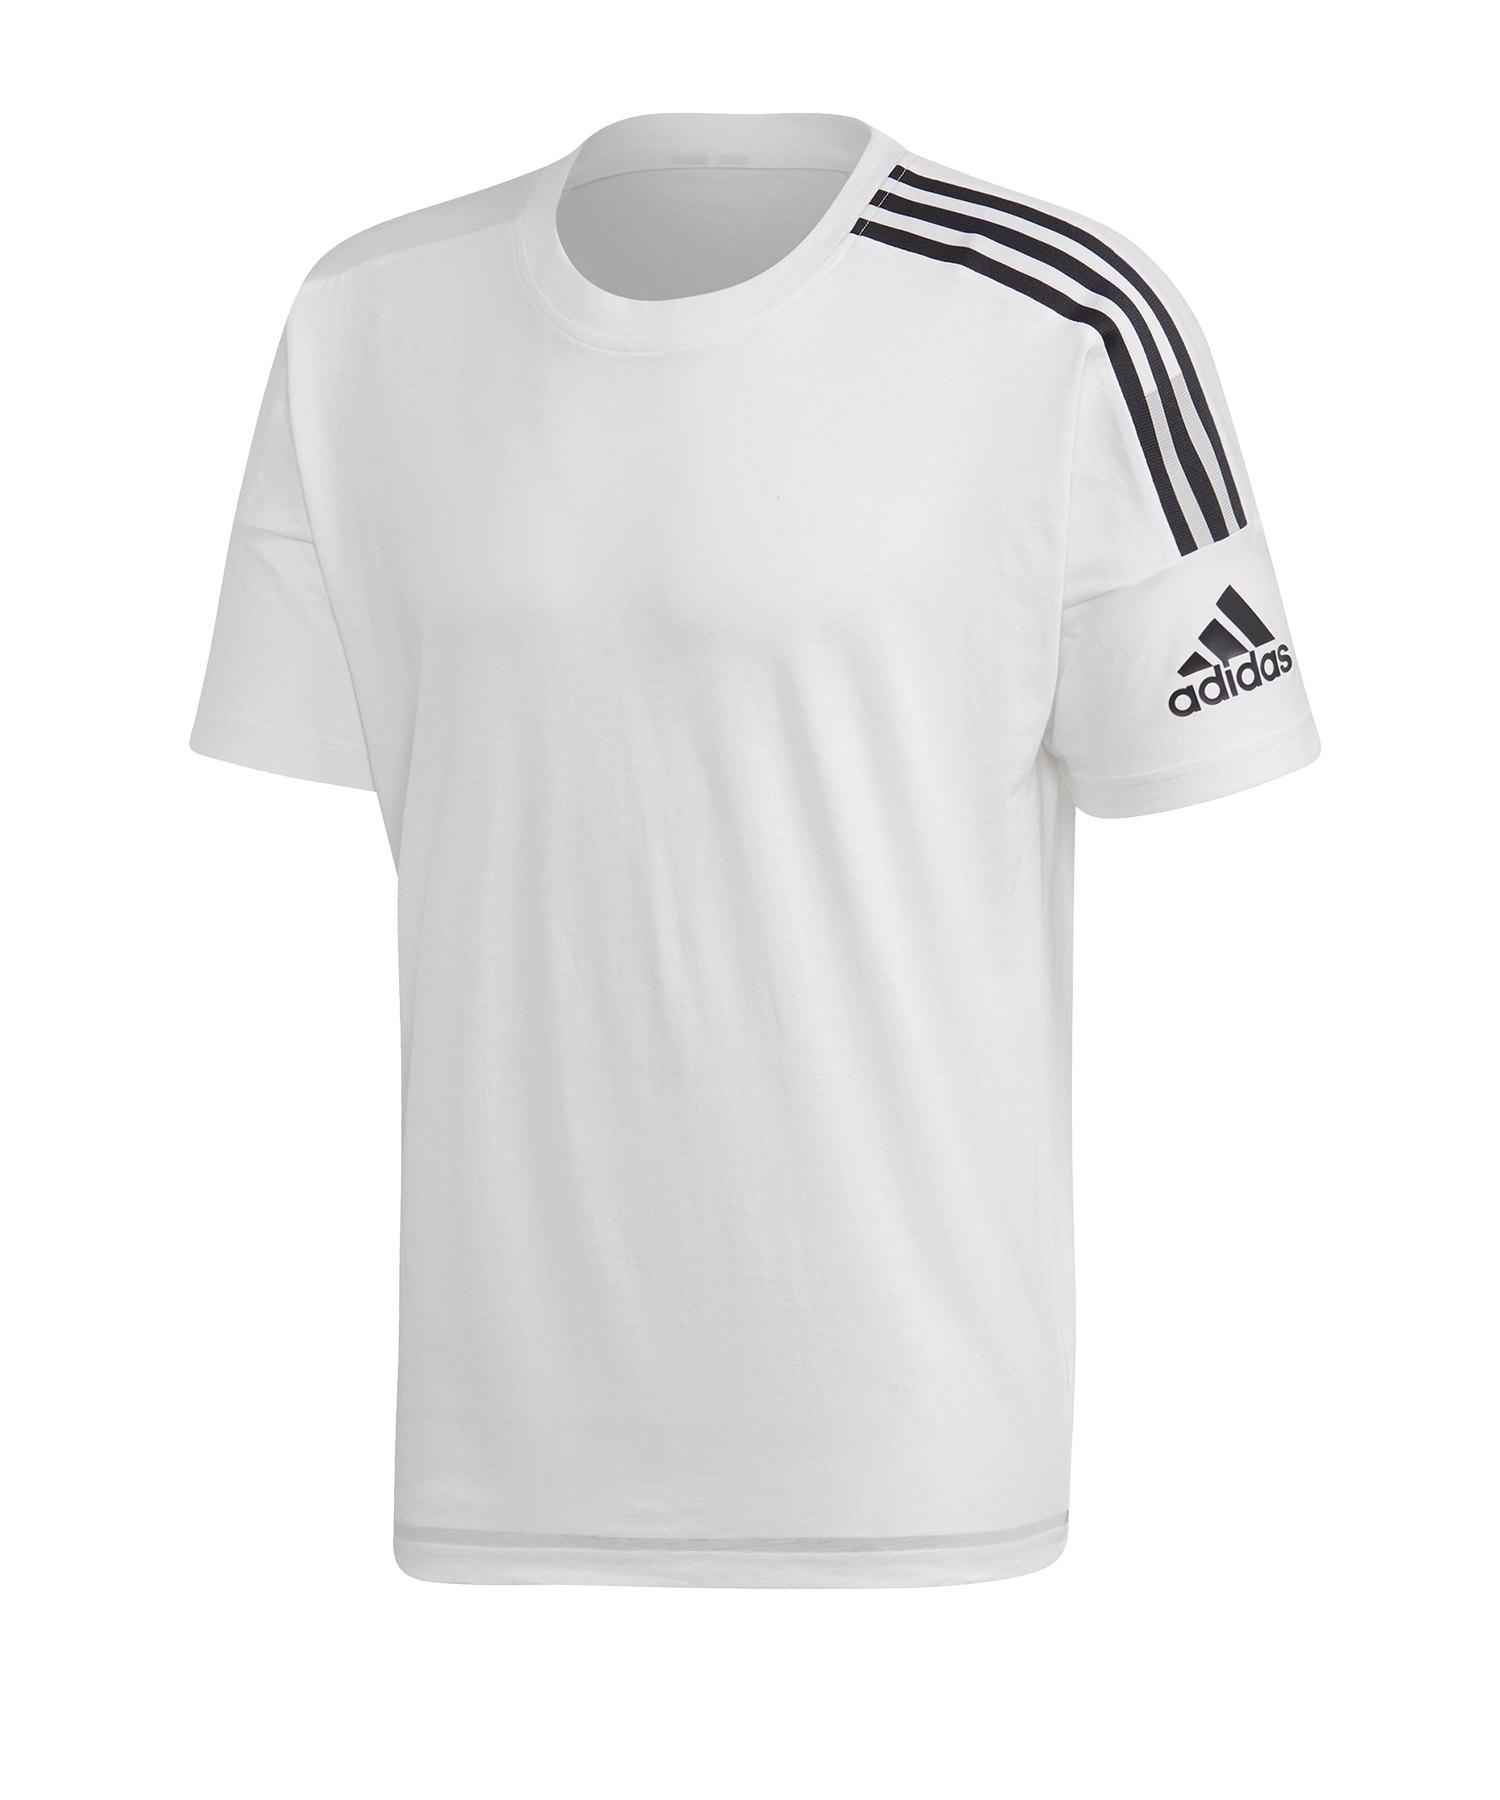 adidas ZNE 3ST Tee T-Shirt Weiss Schwarz - weiss